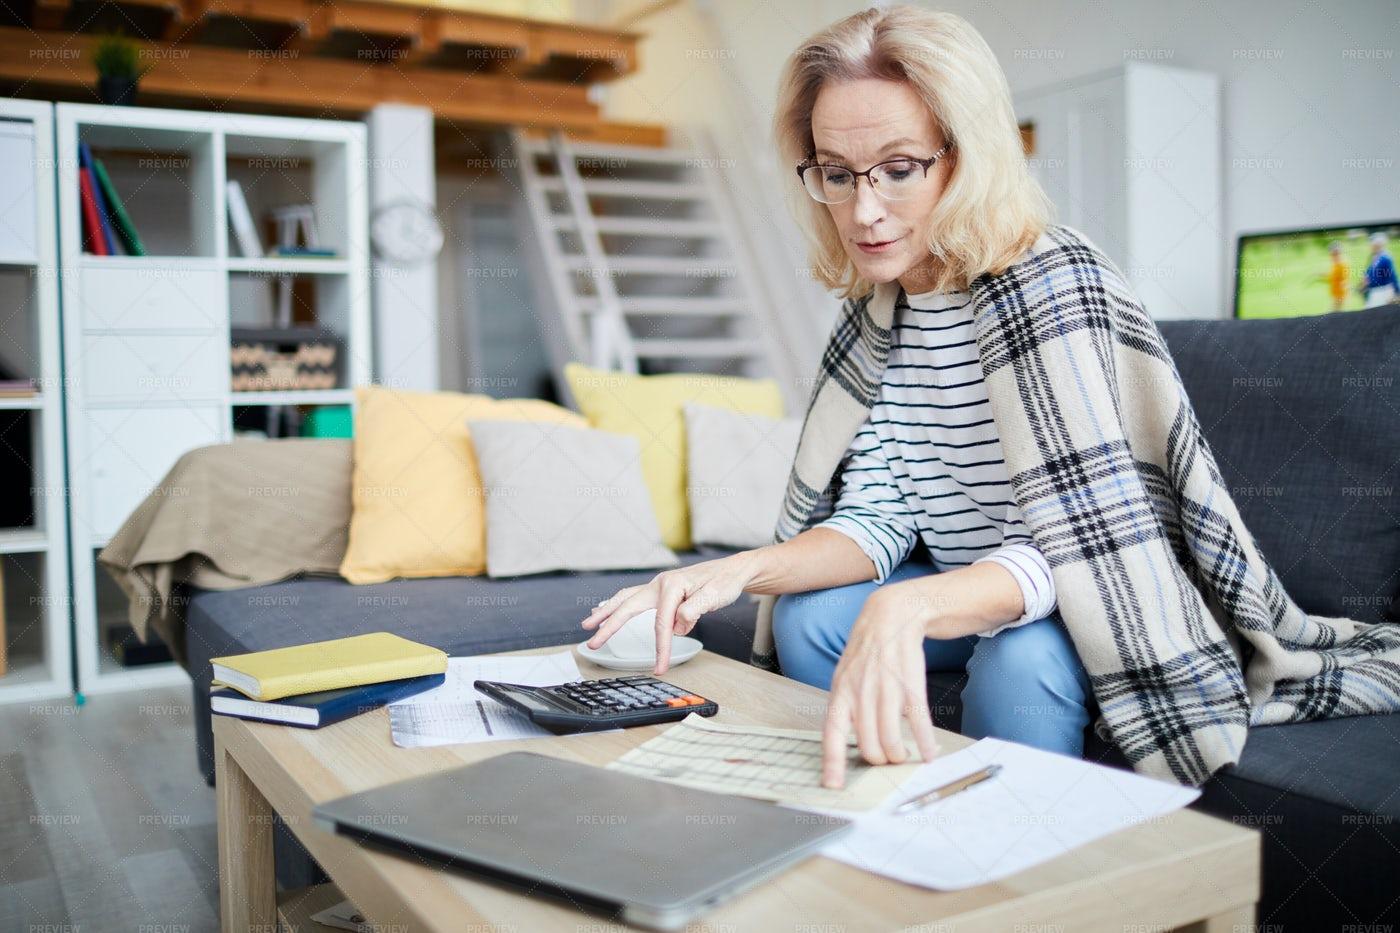 Calculating Home Budget: Stock Photos